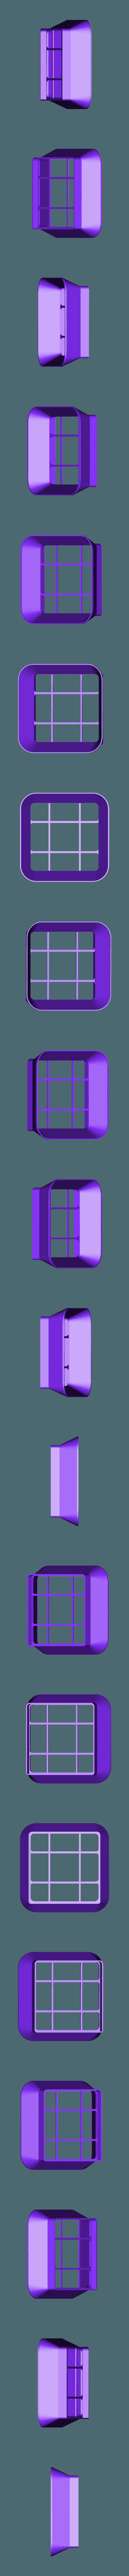 Air_condenser.STL Download free STL file DIY Solder Fume extractor with variable power • 3D printable model, ellisdrake21